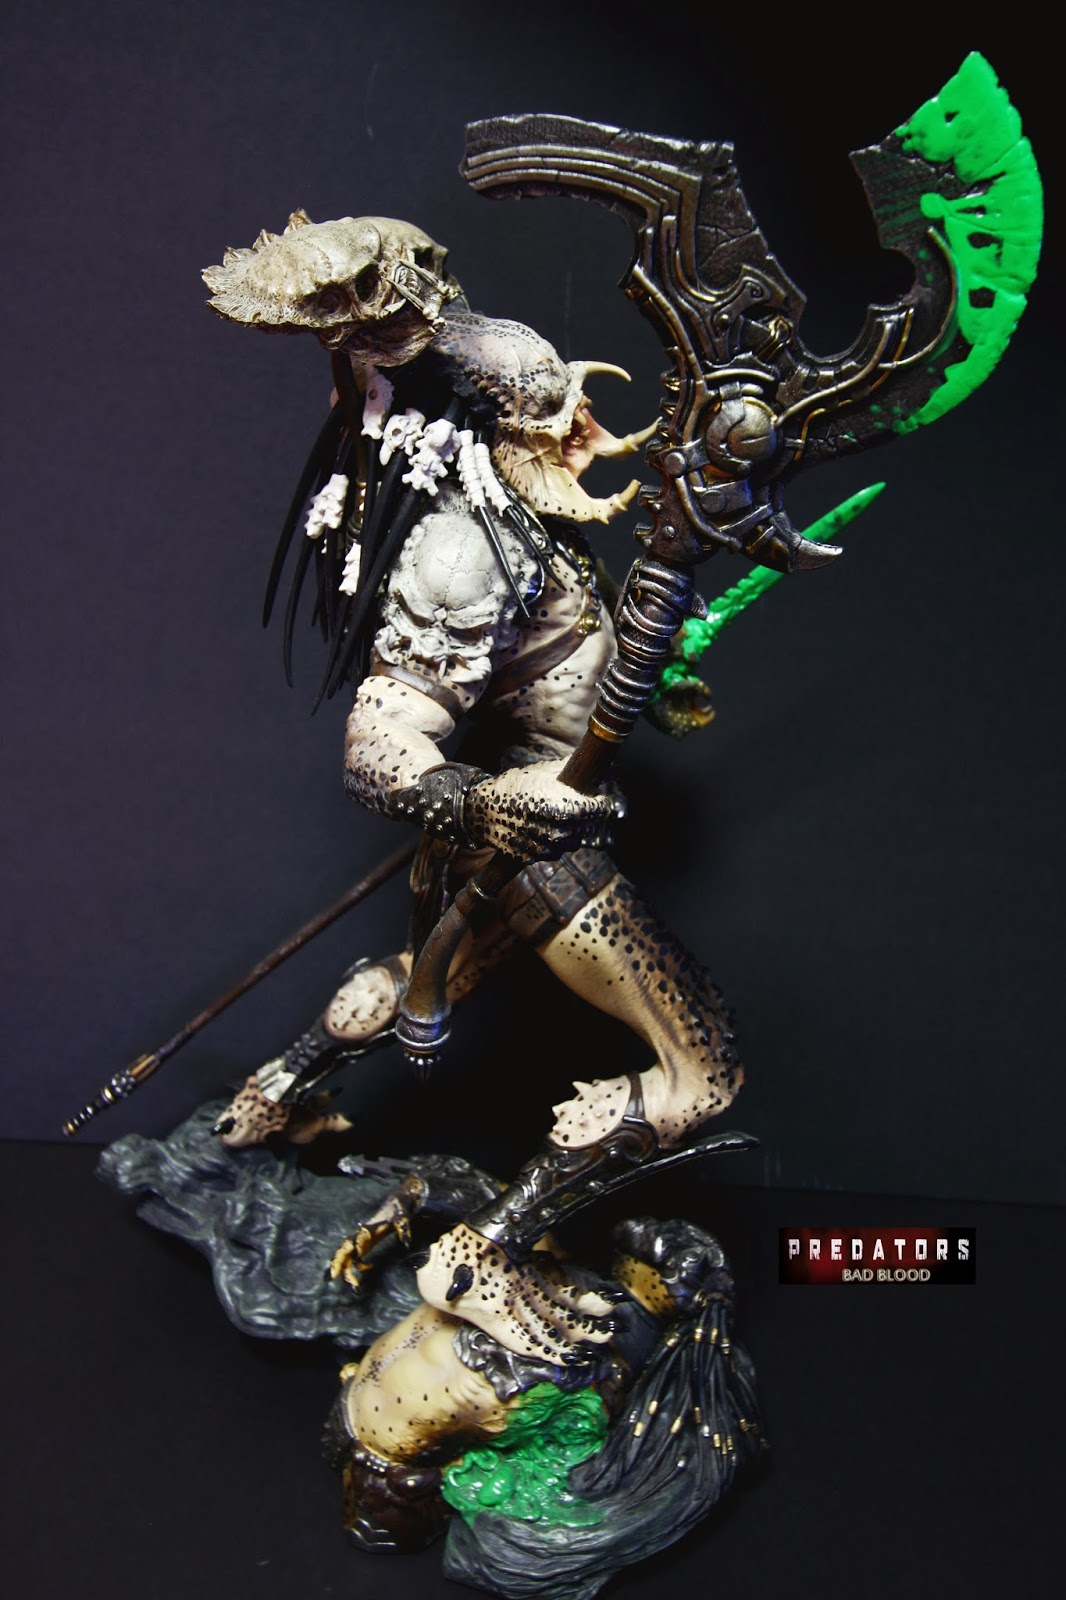 Tsr Predator Bad Blood